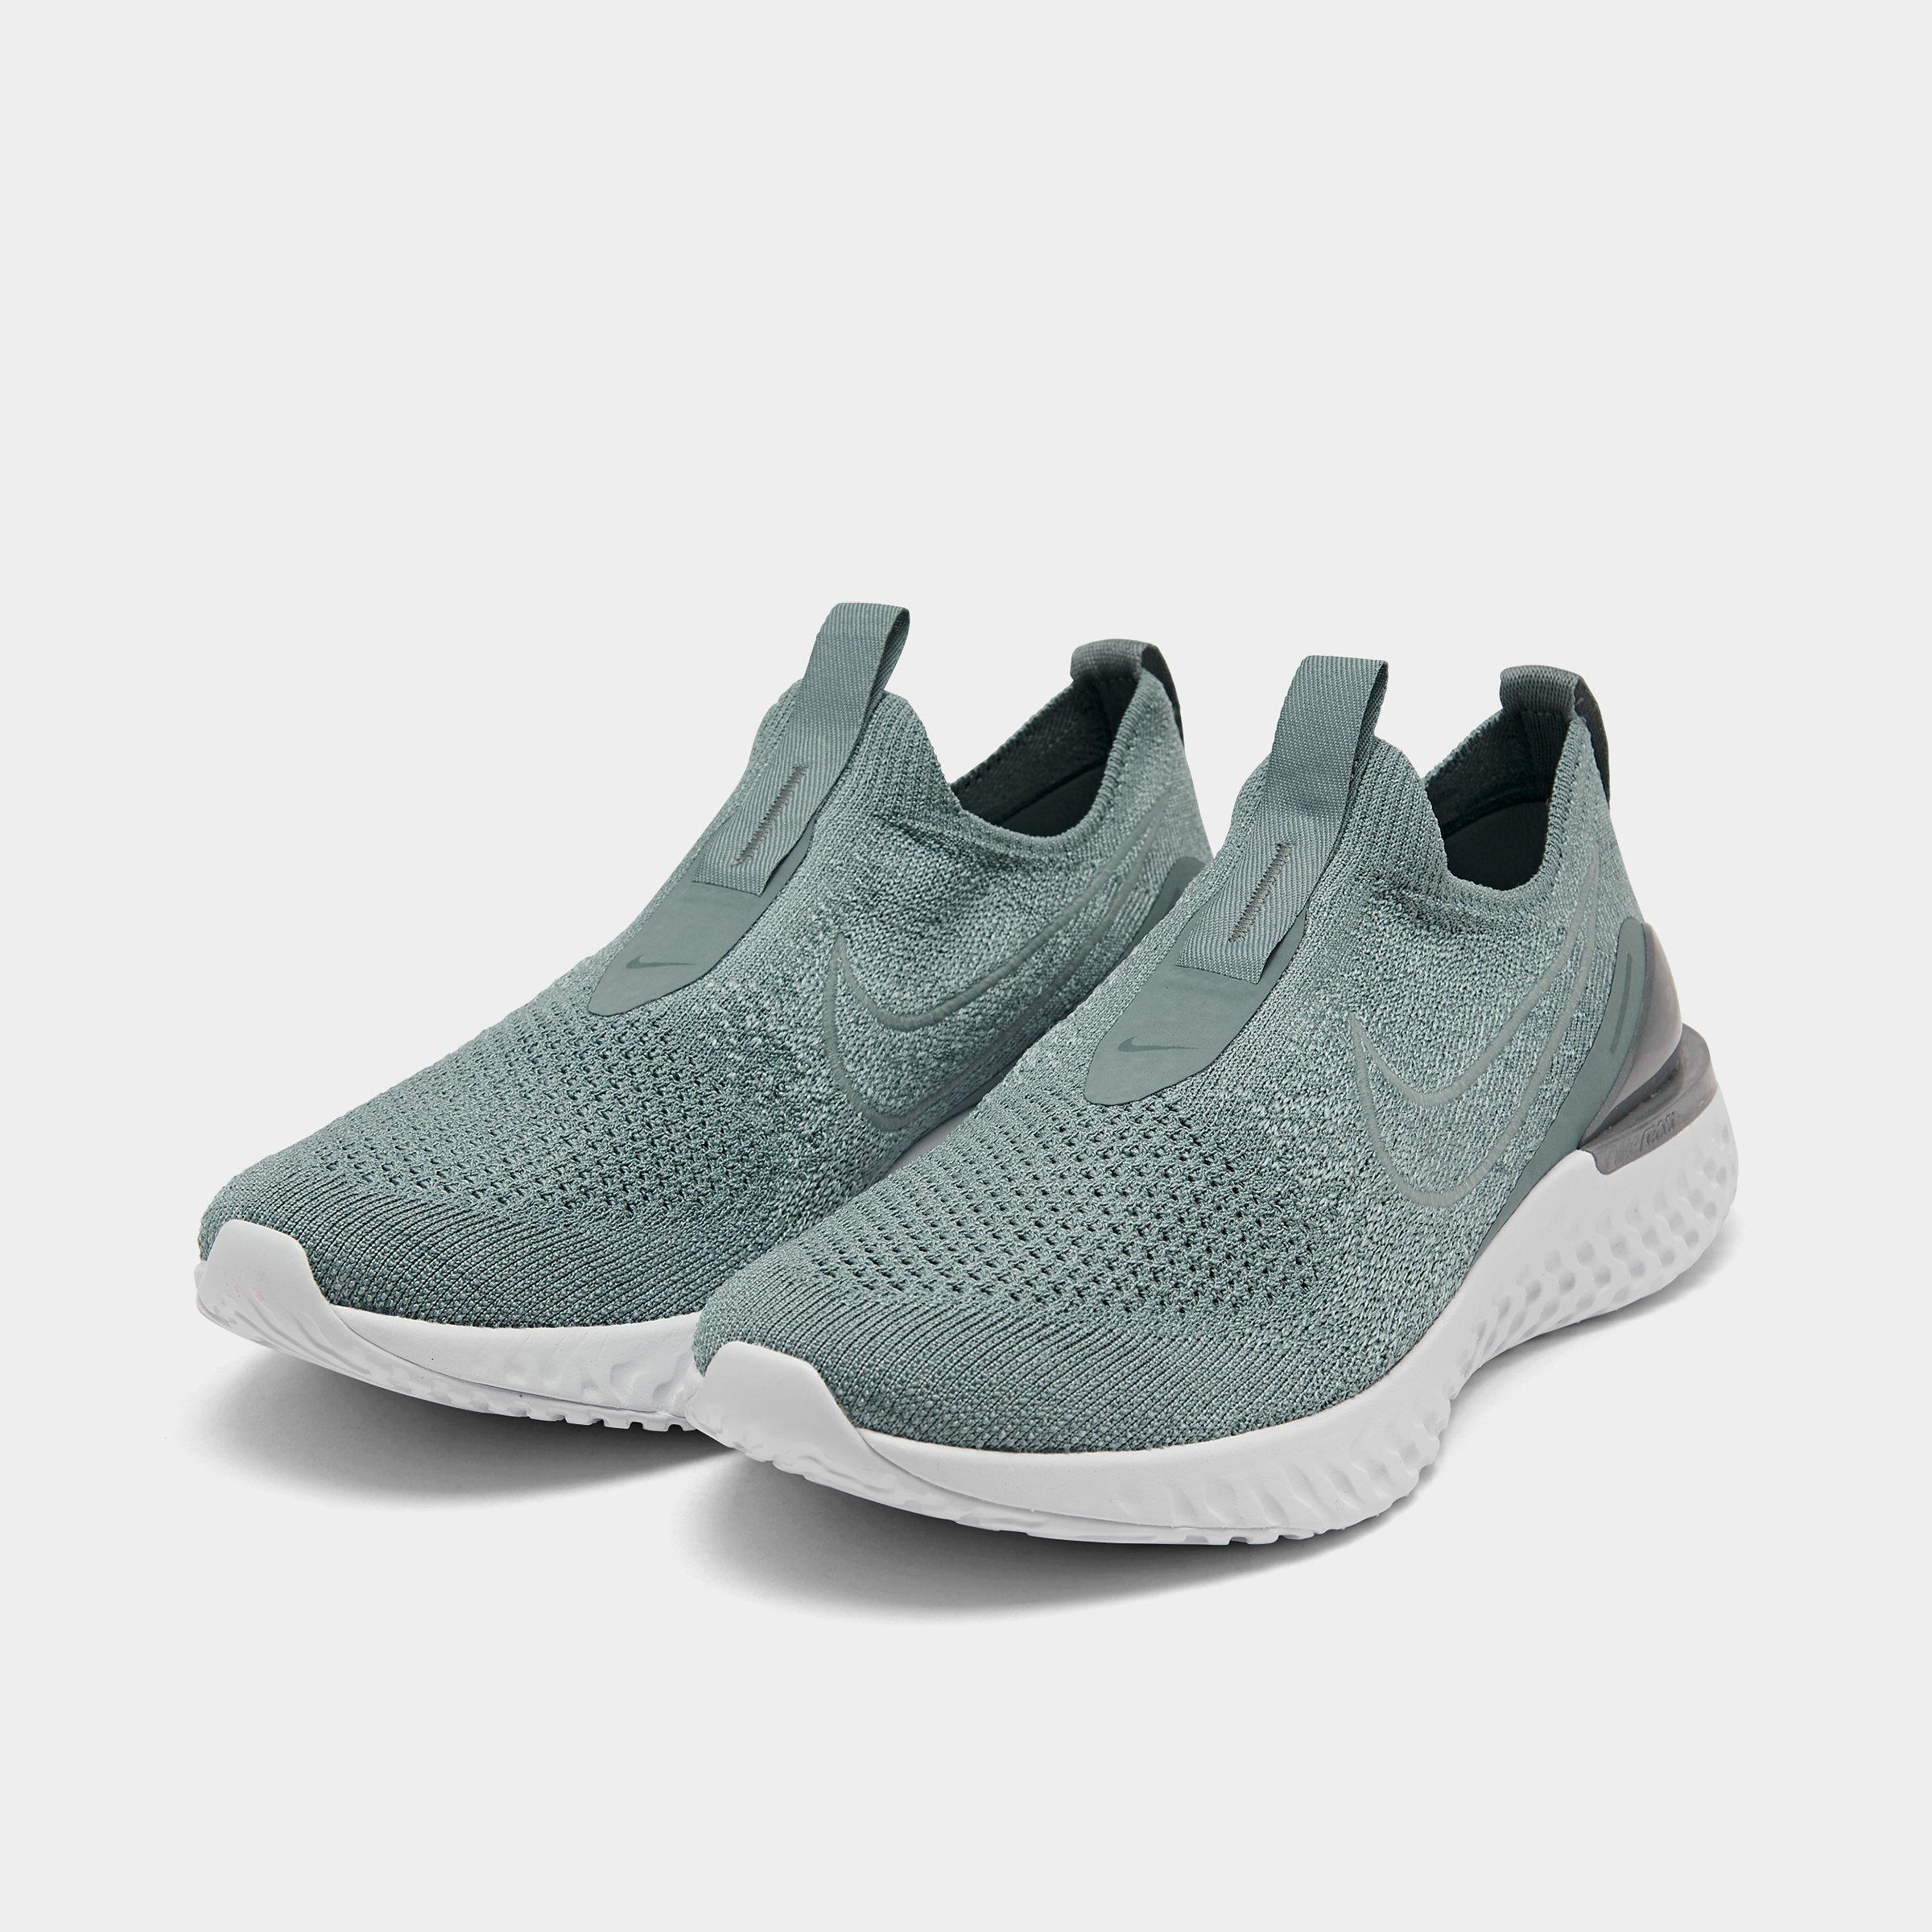 BV0415-200 Nike Epic Phantom React Flyknit Women/'s Running Shoes